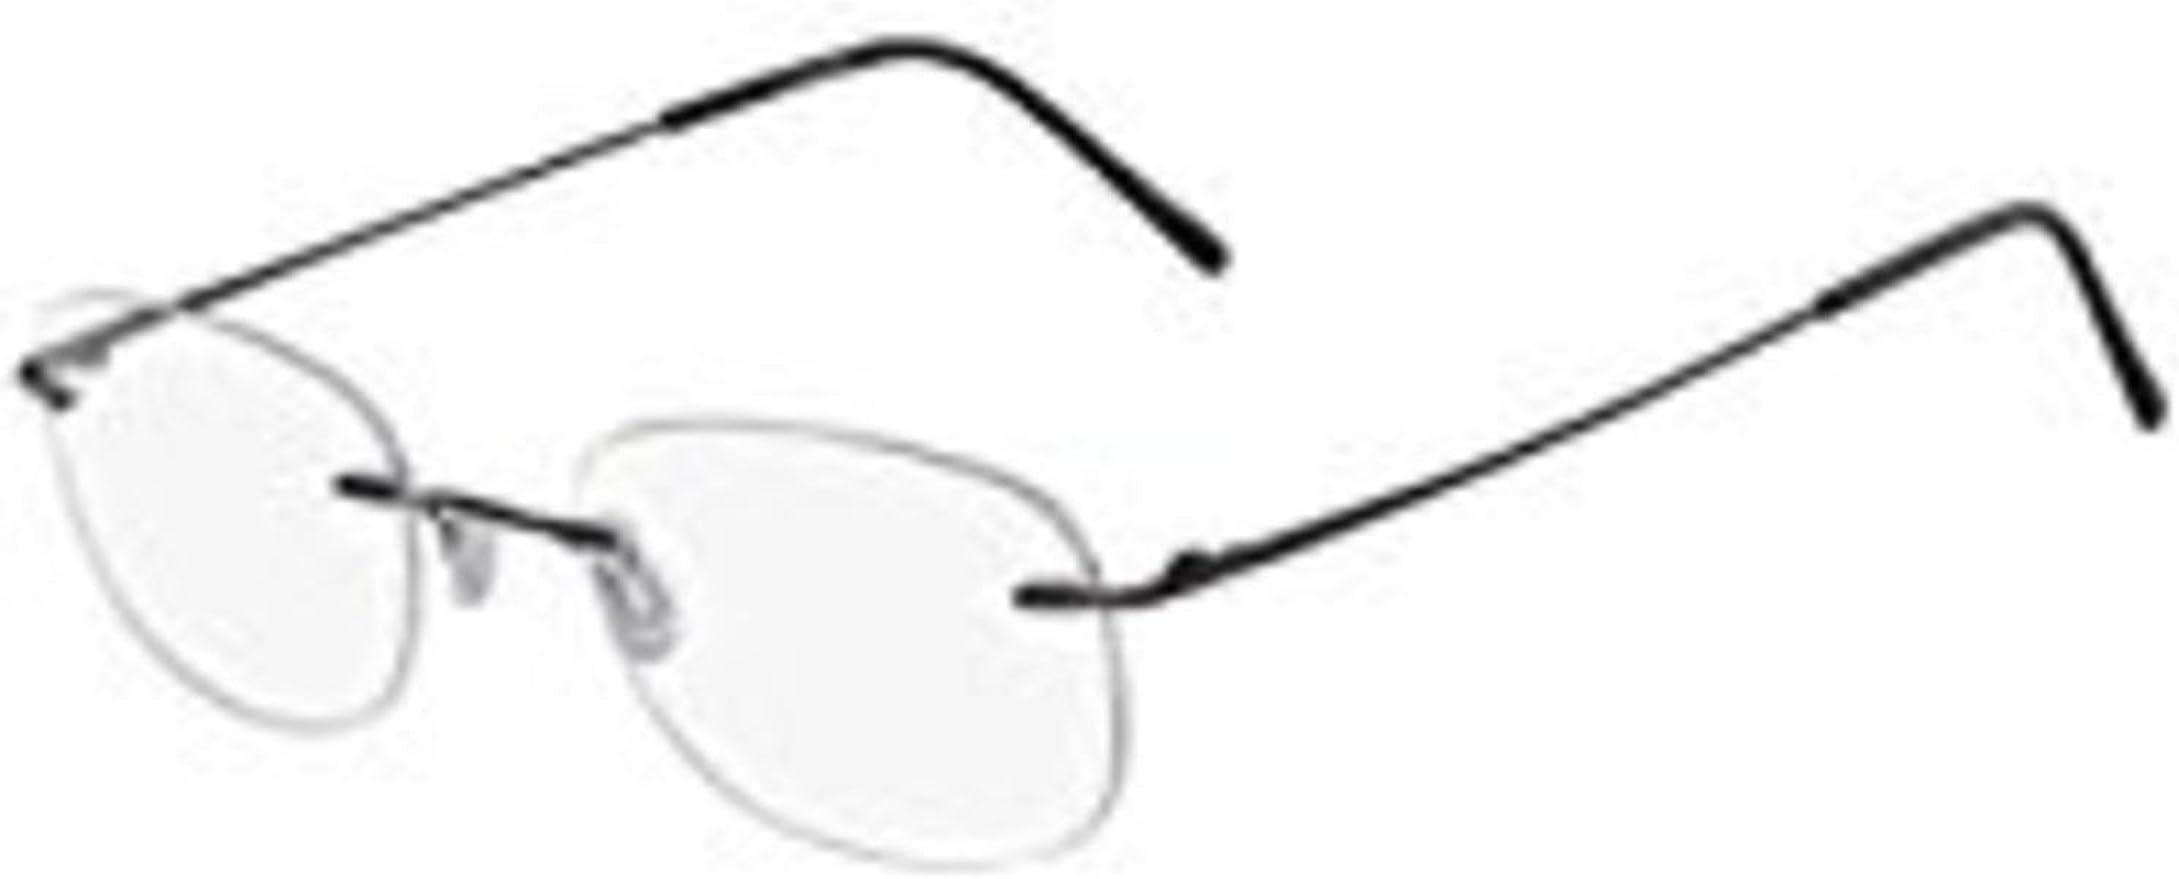 Eyeglasses MARCHON AIRLOCK AL WISDOM 046 SATIN SILVER